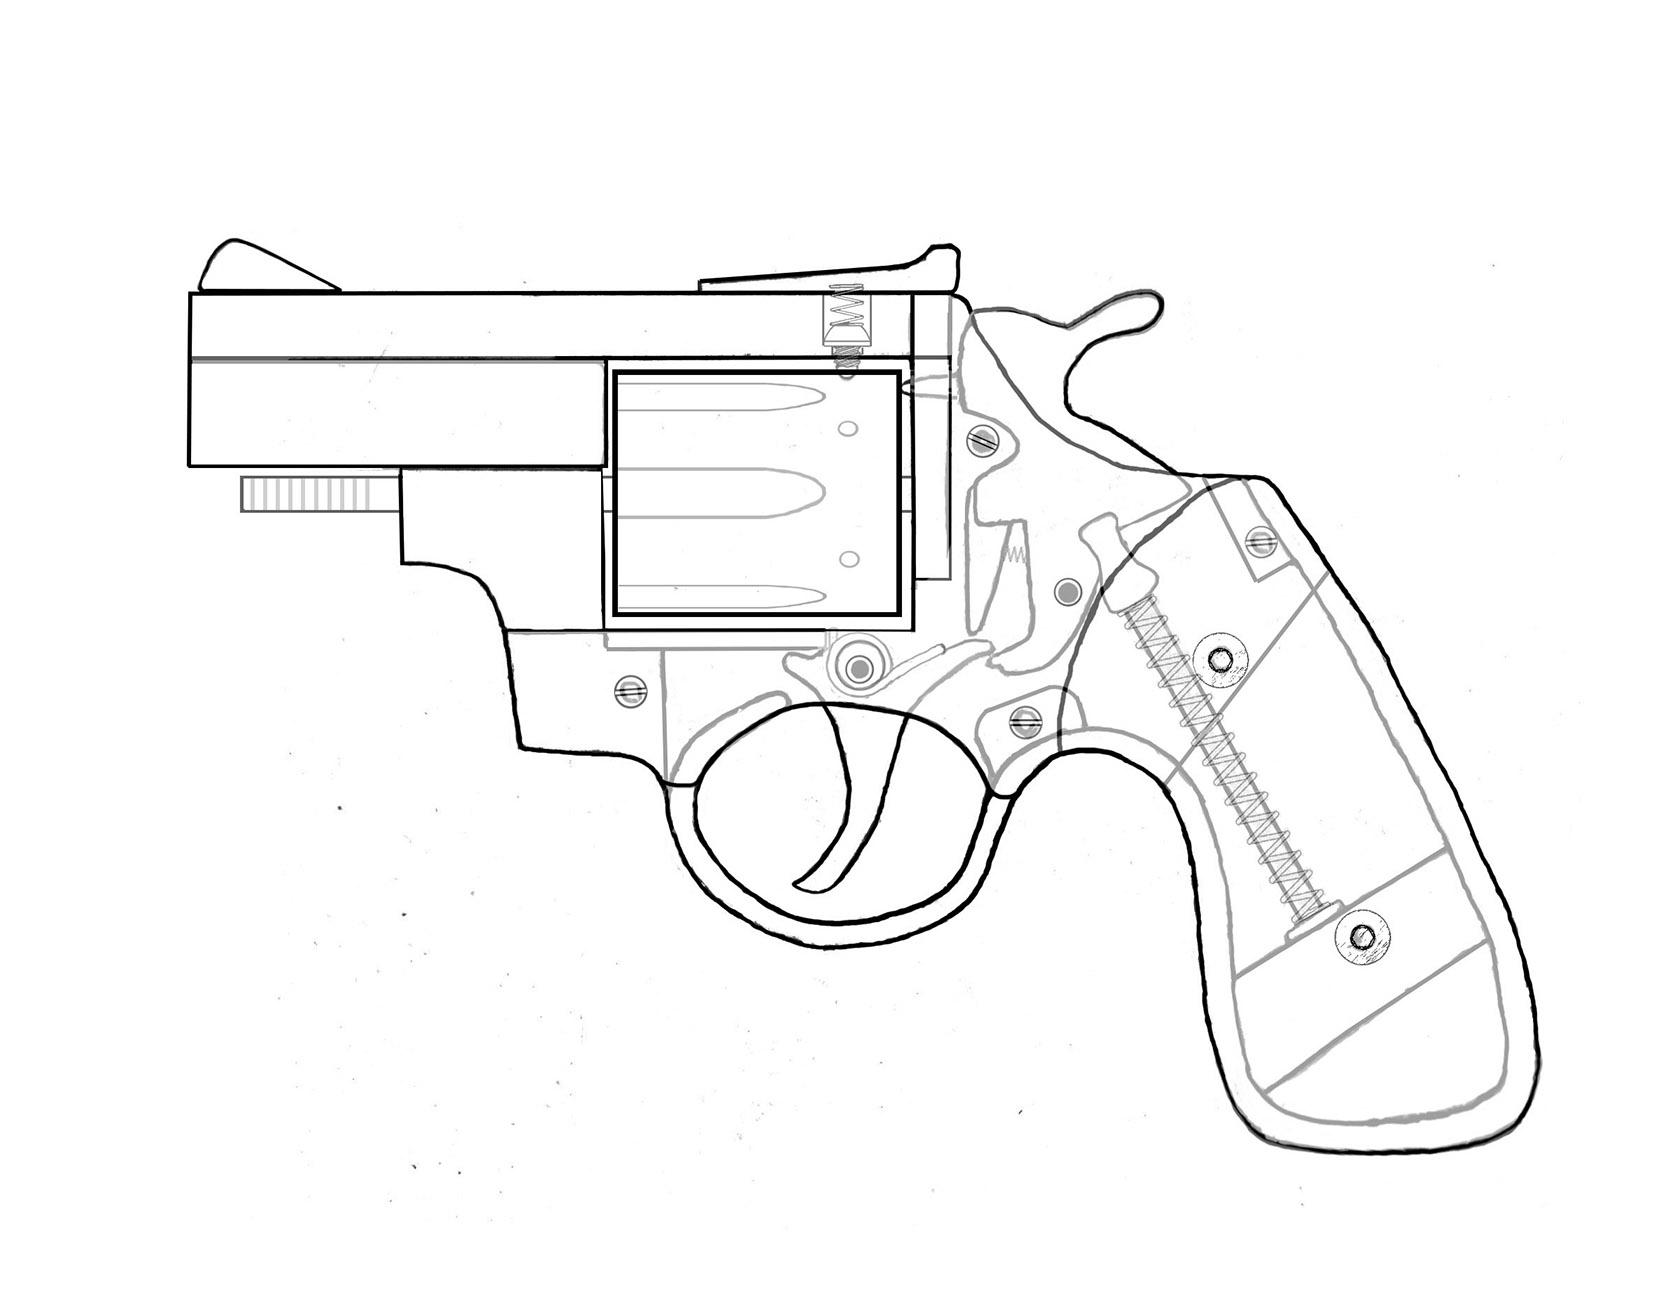 1678x1311 Homemade Revolver Impro Guns